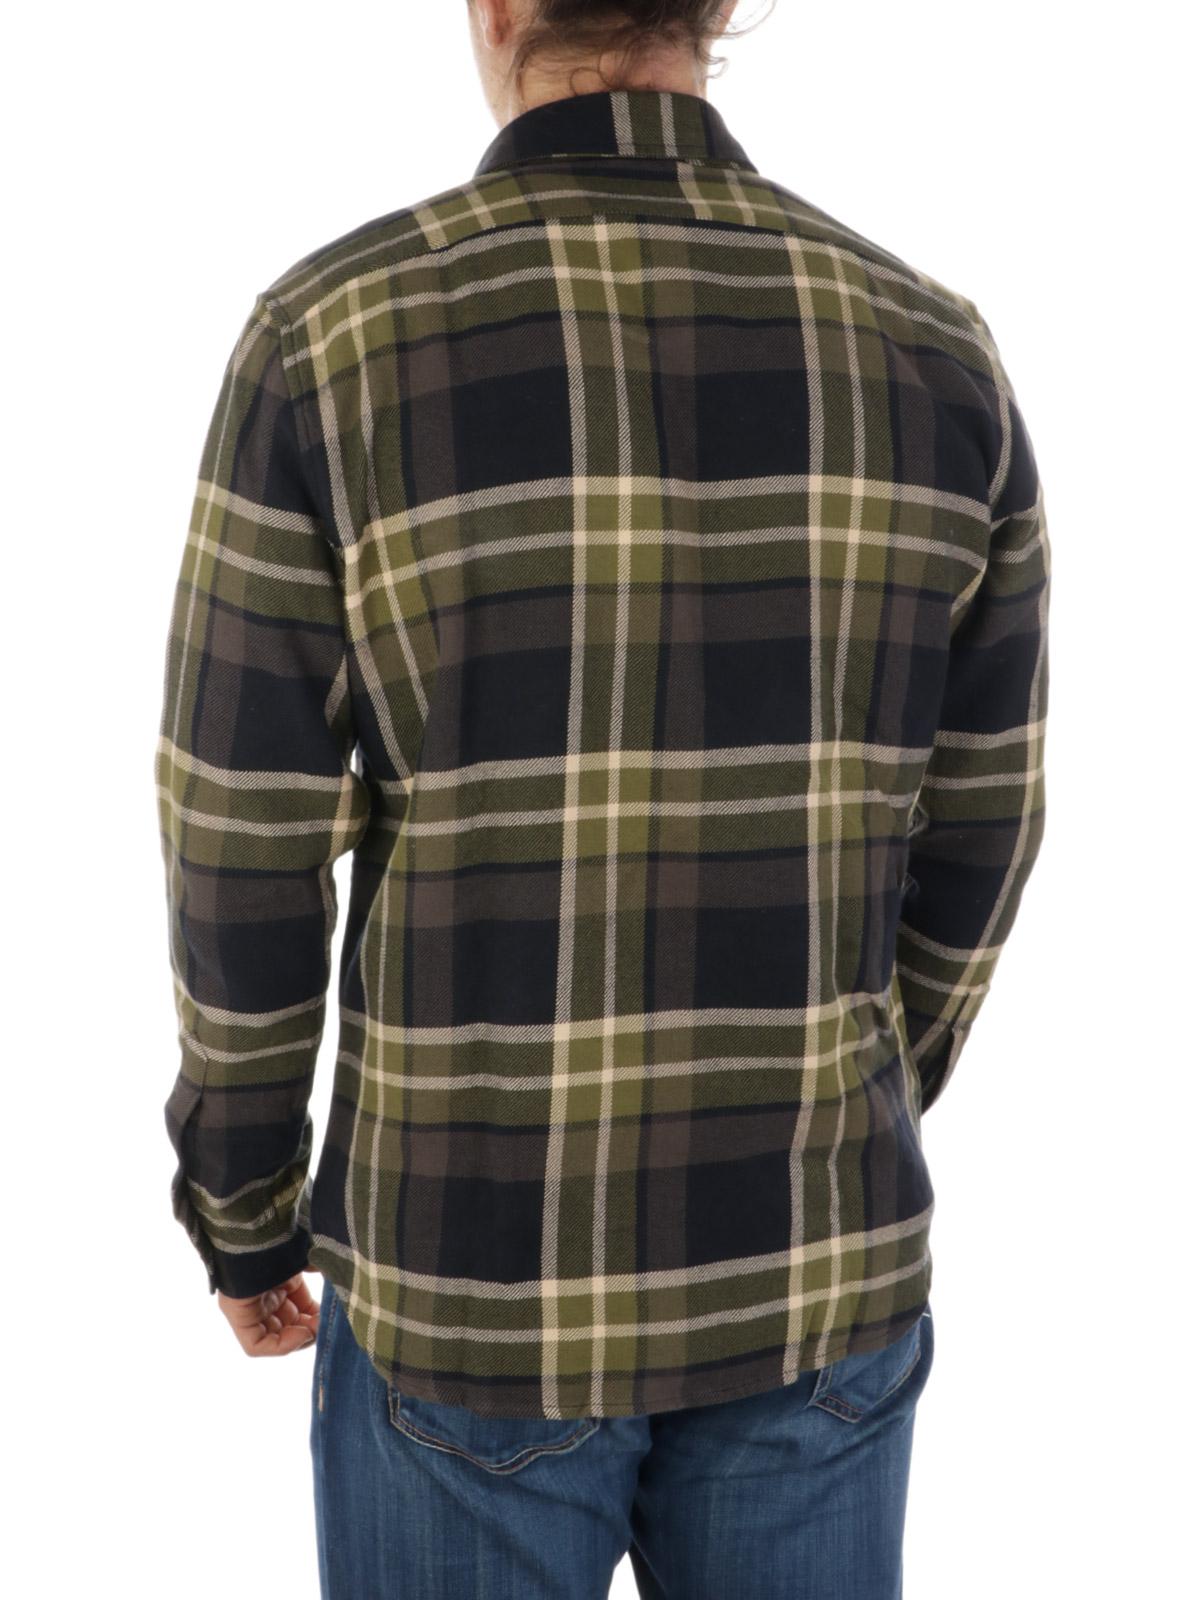 Immagine di ASPESI   Camicia Uomo a Quadri